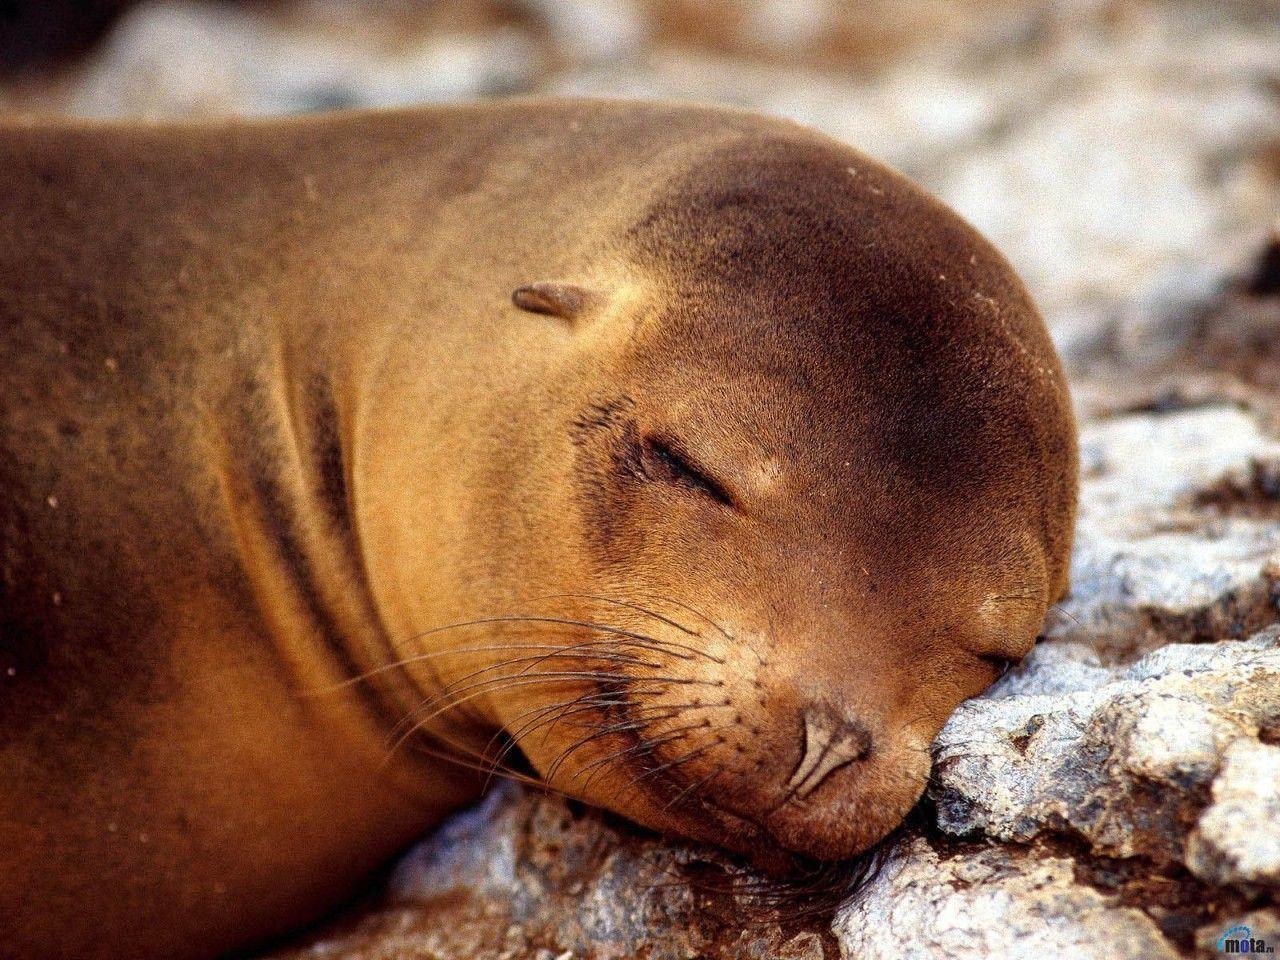 Cute Baby Dolphin Wallpaper Cute Seal Wallpaper Animal